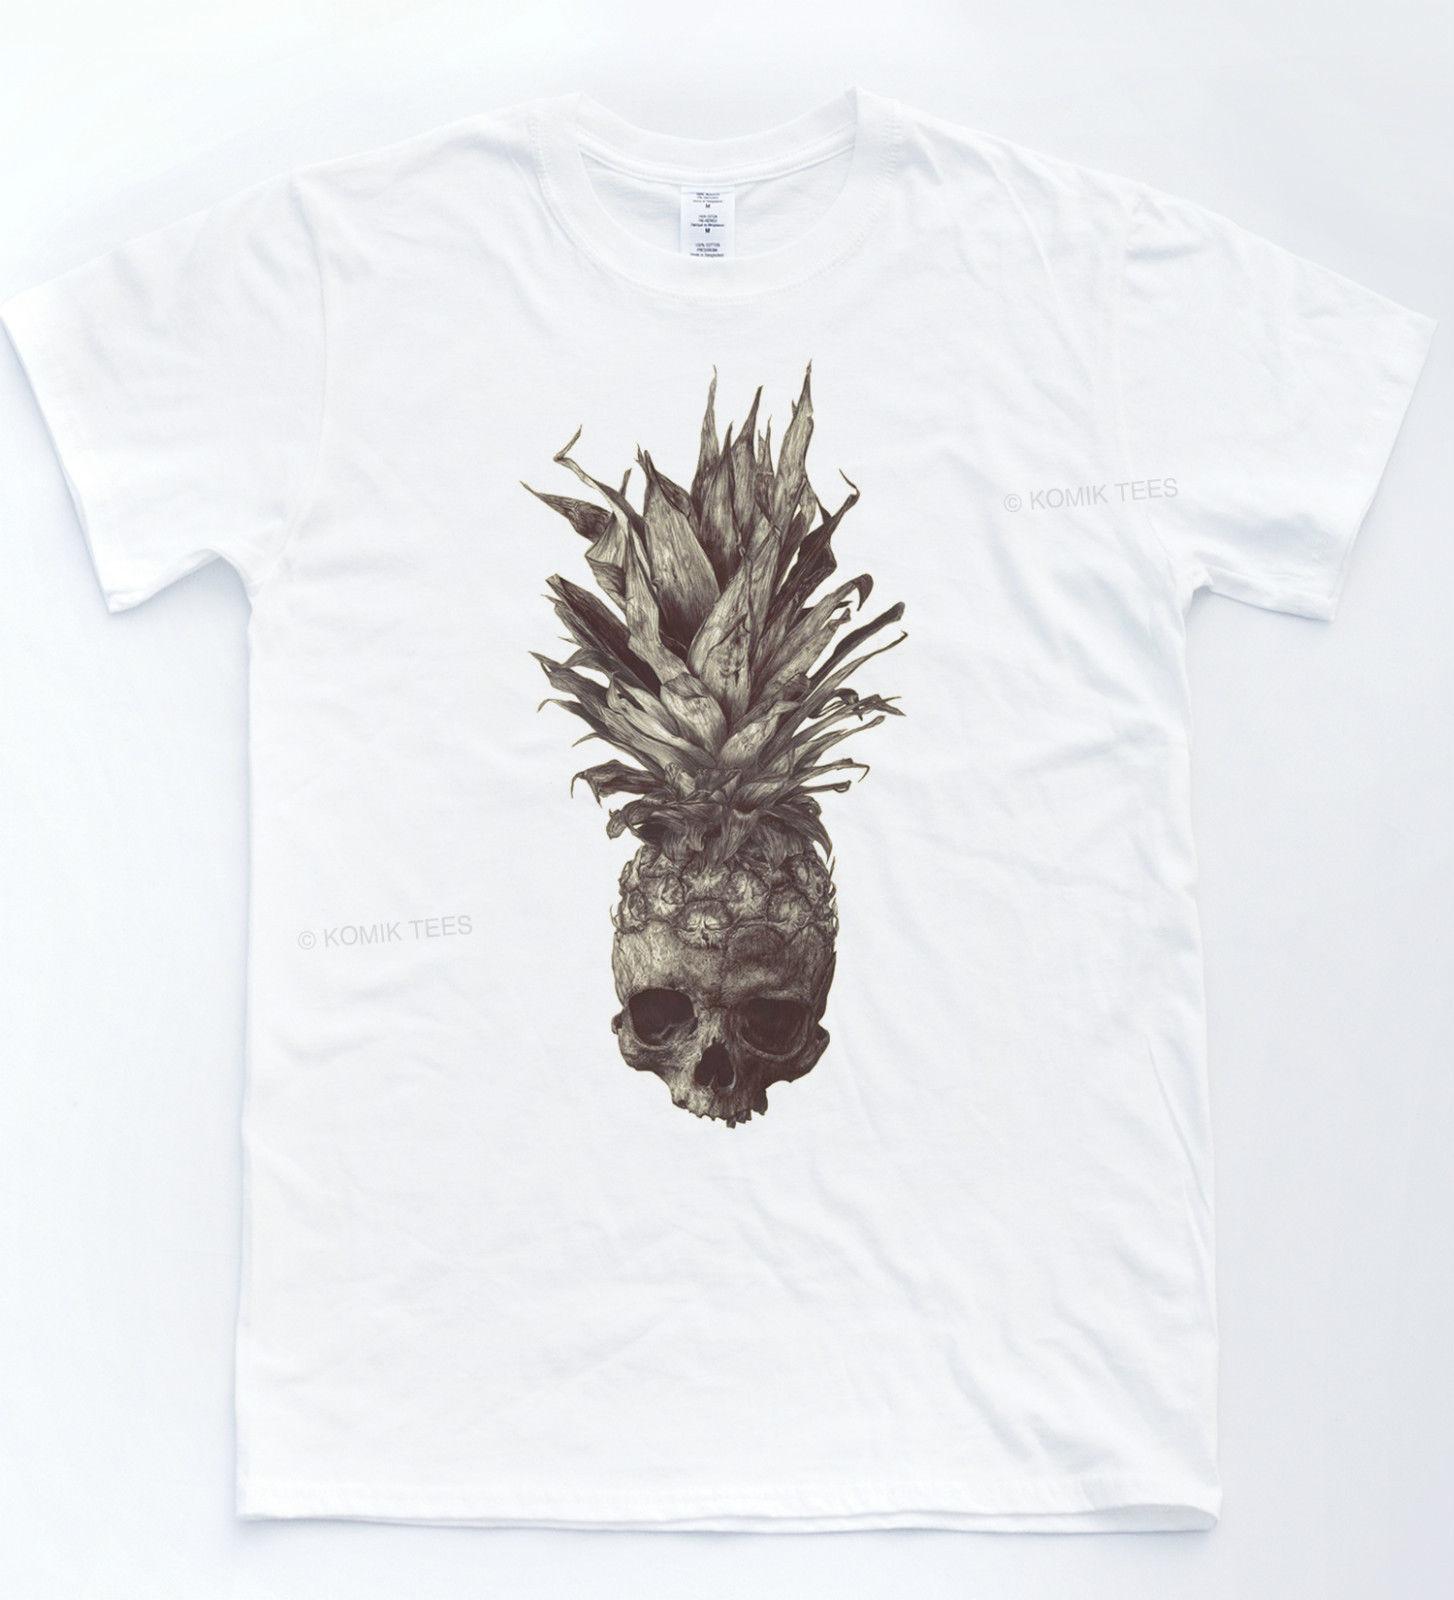 Skeletton Pineapple Indie T-shirt Sketch Drawing Tumblr Tee Vintage Sepia Top